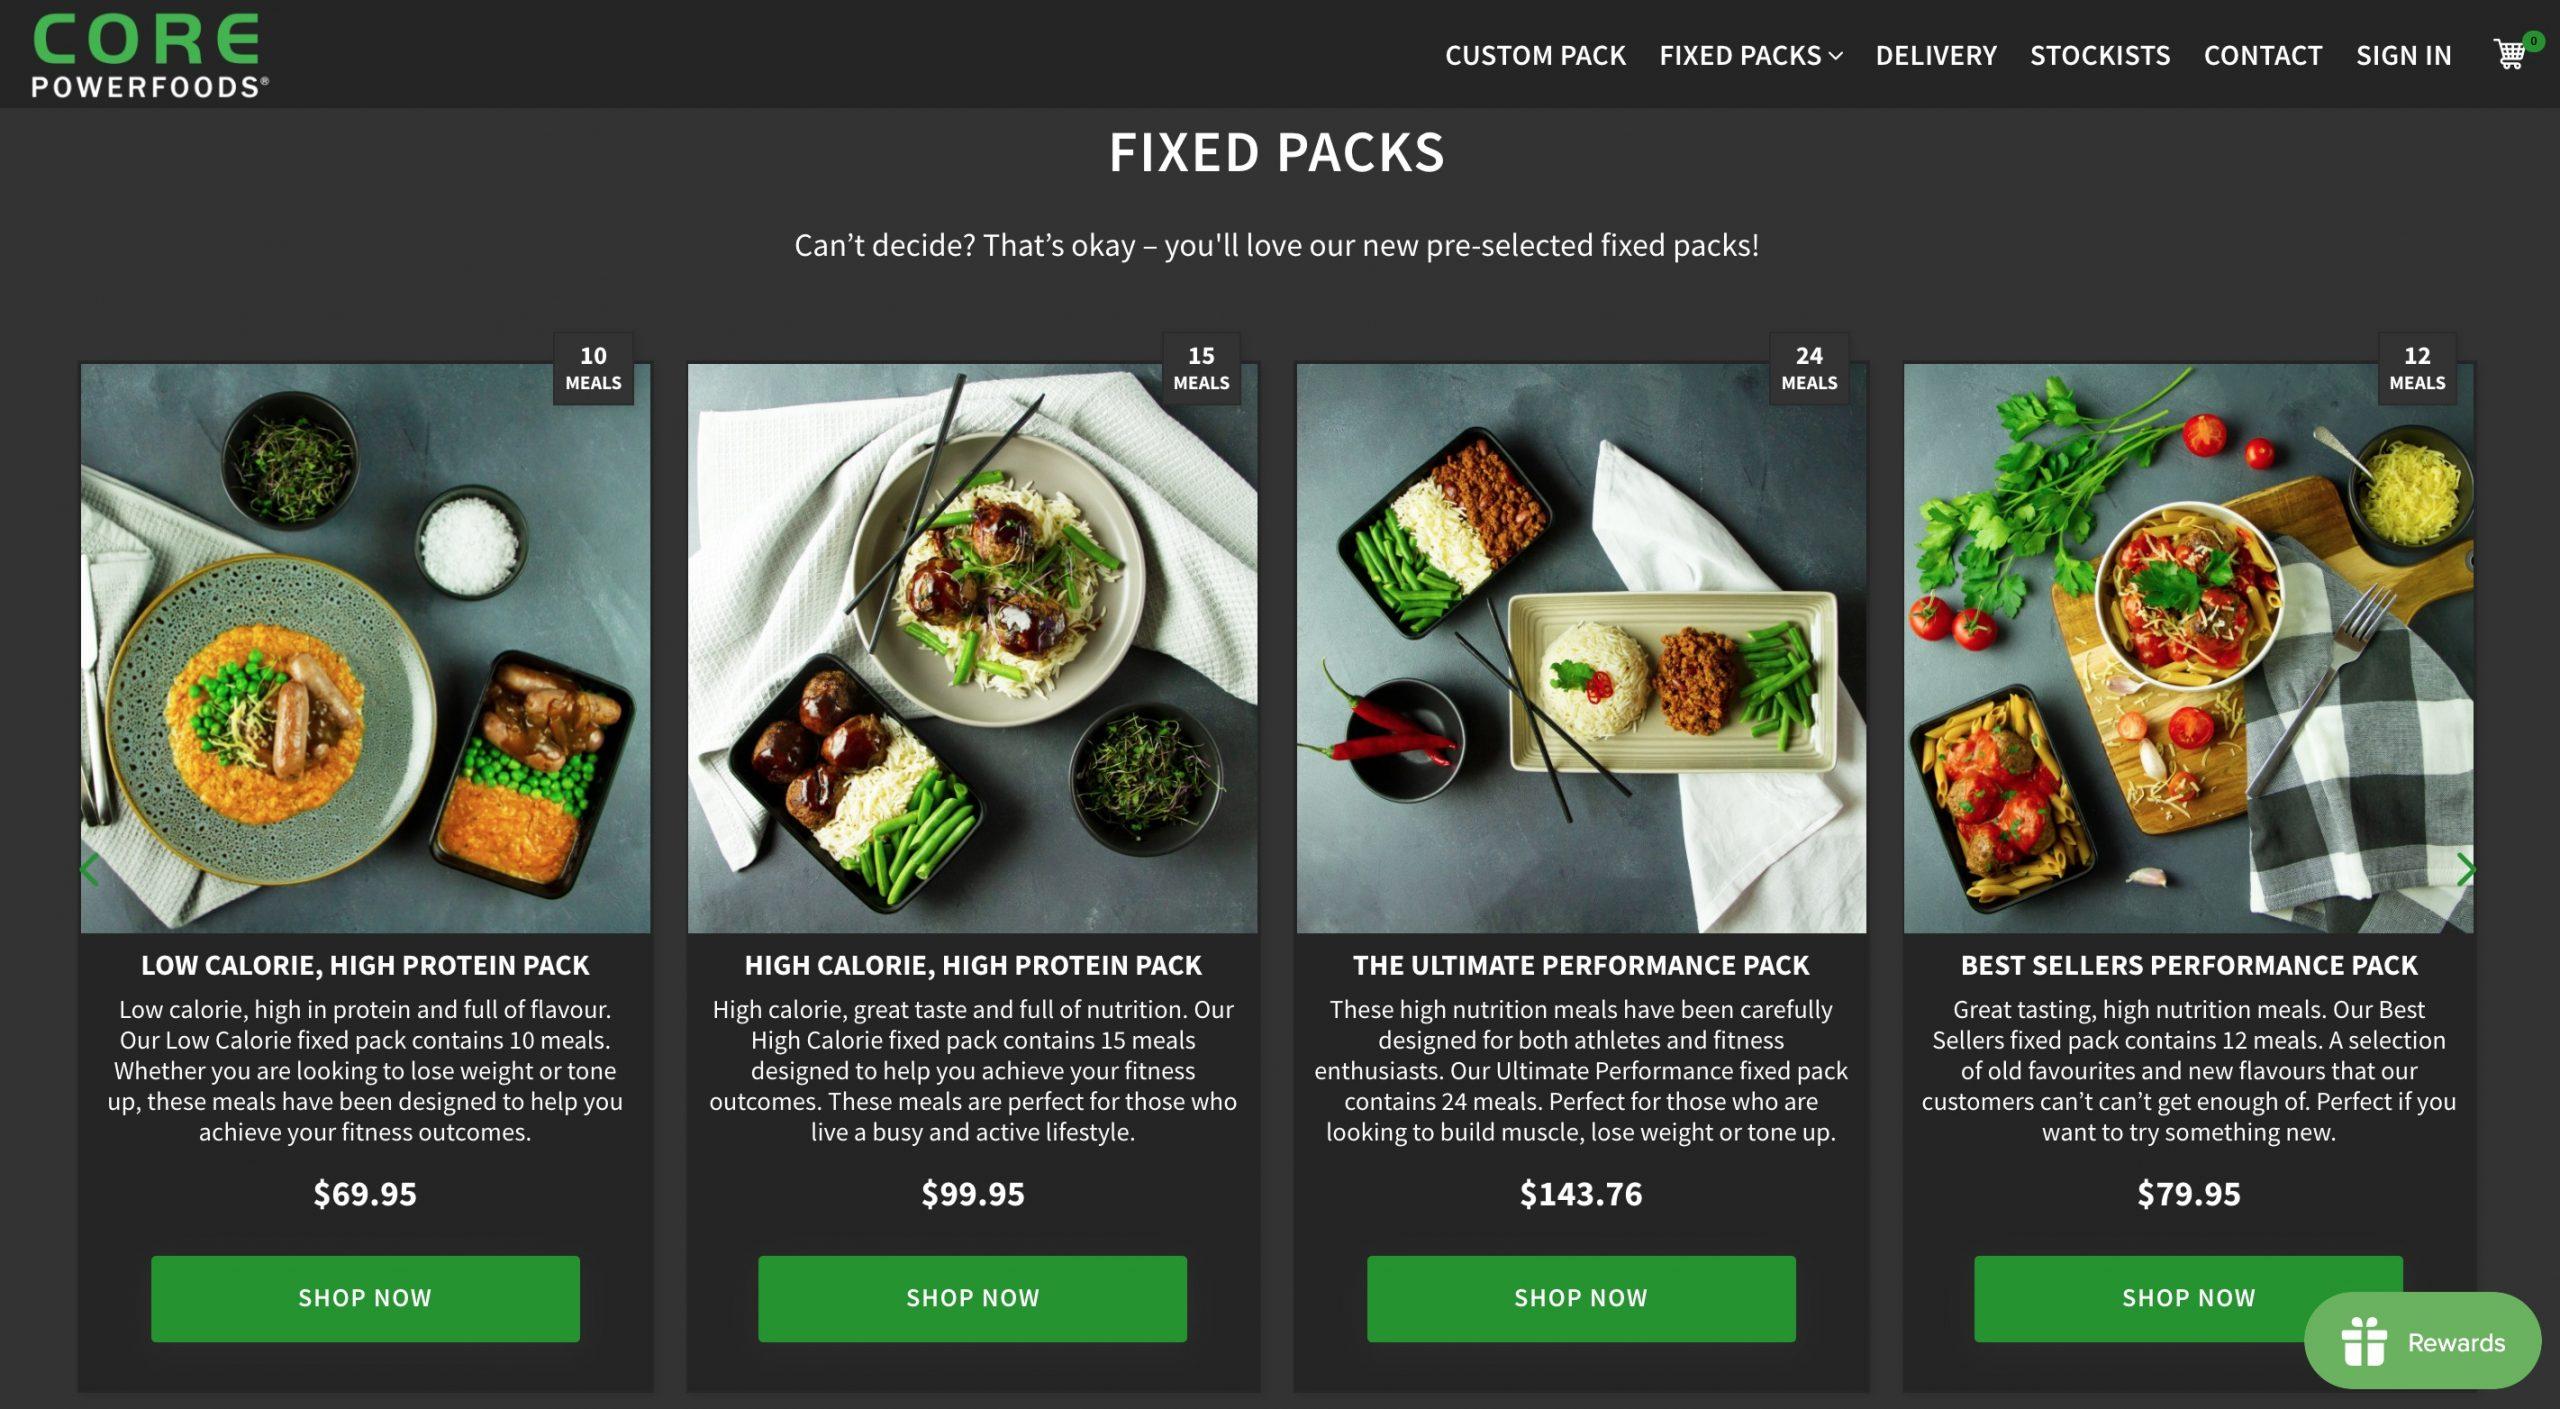 Core Power Foods menu